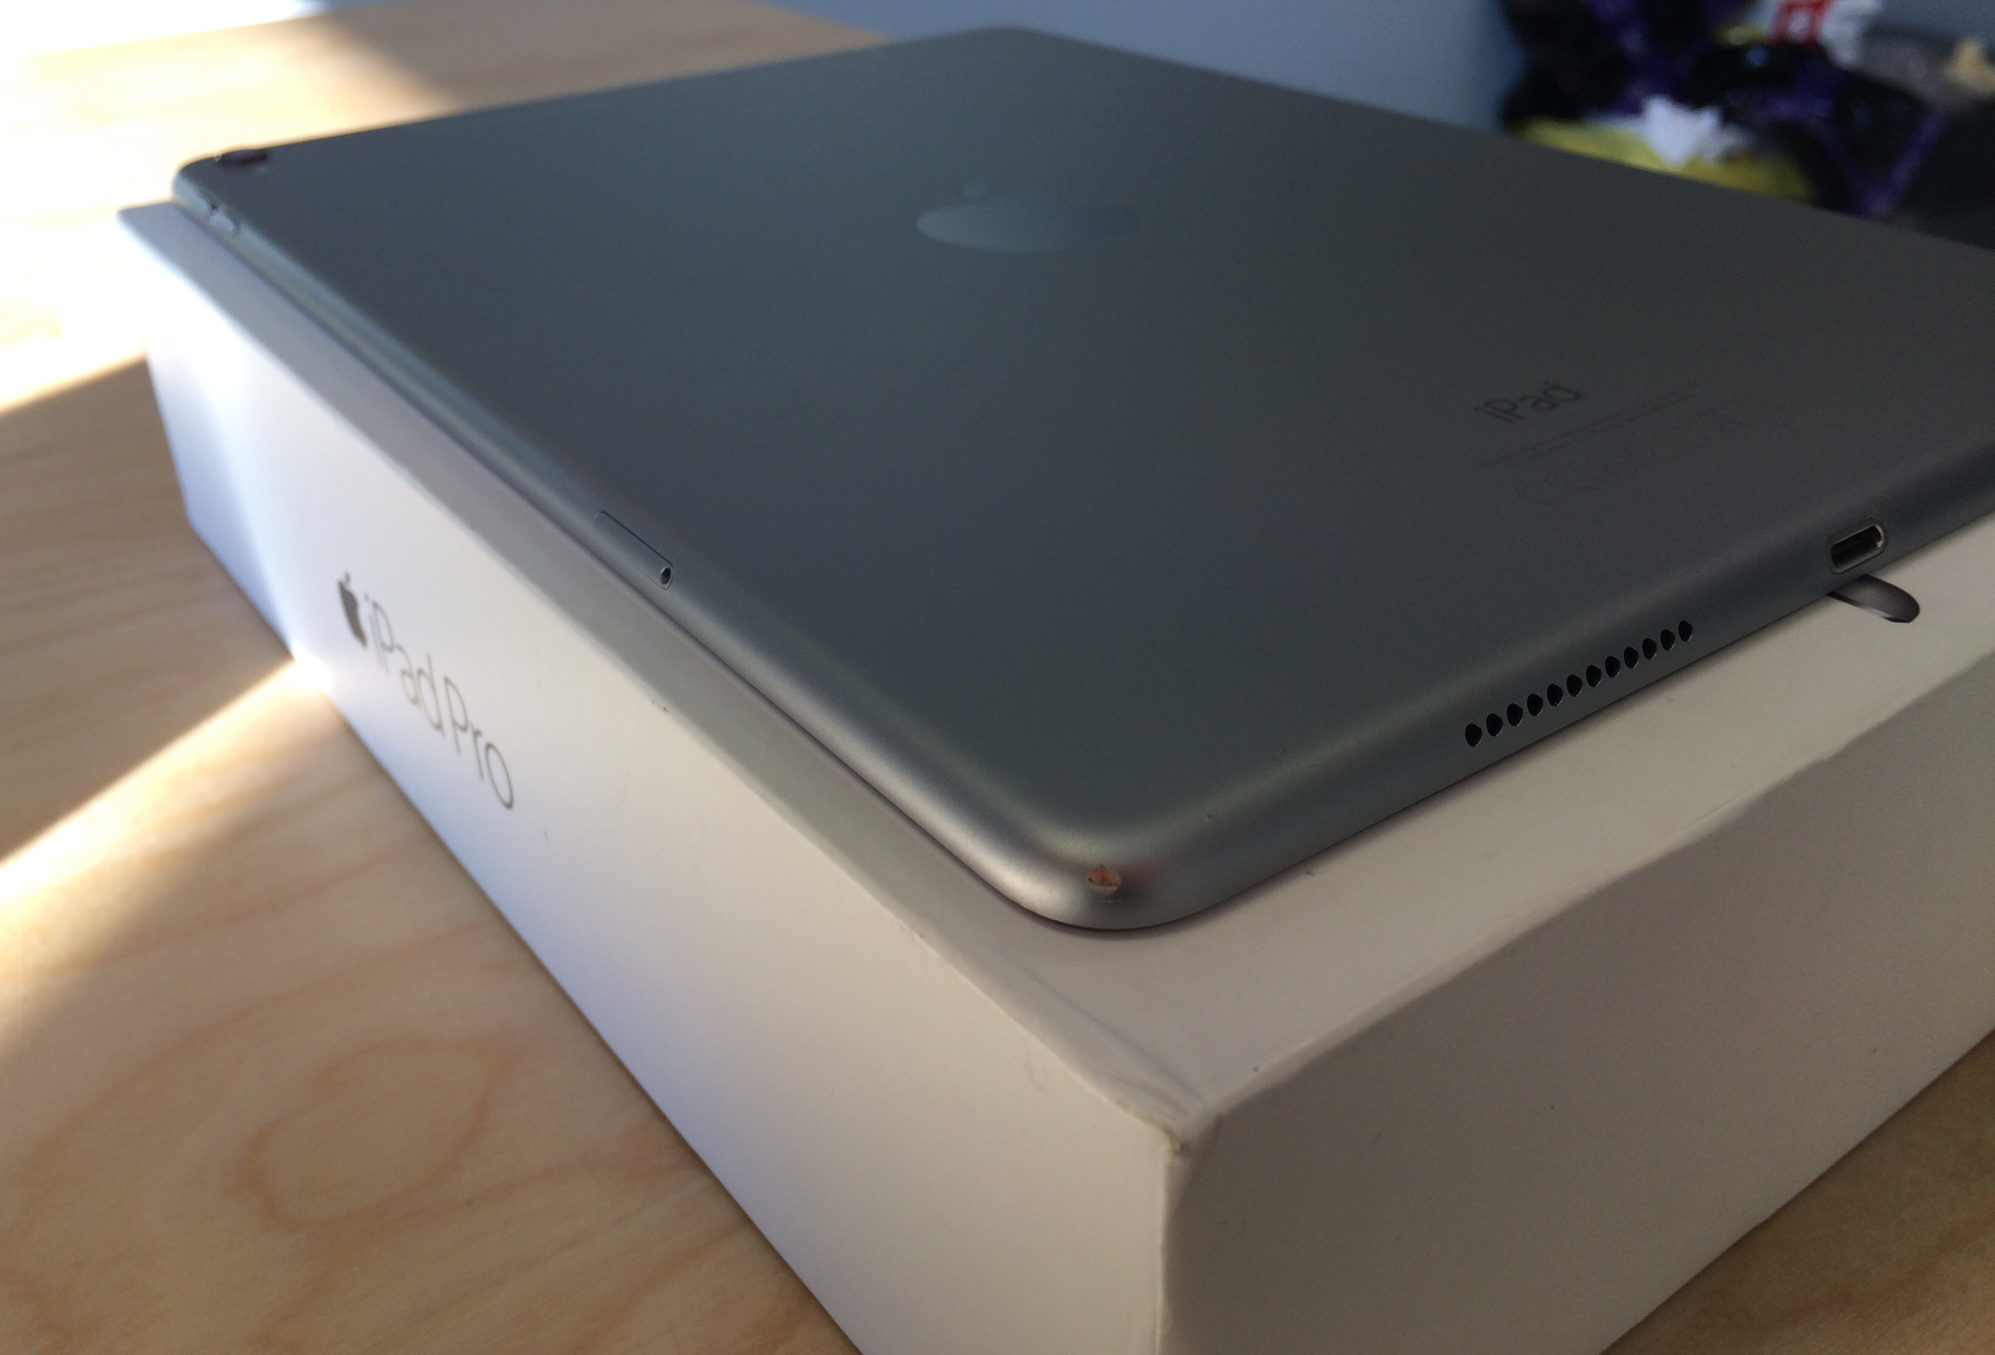 iPad Pro 9.7-inch (Wi-Fi + 4G), 32 GB, SPACE GRAY, imagen 4